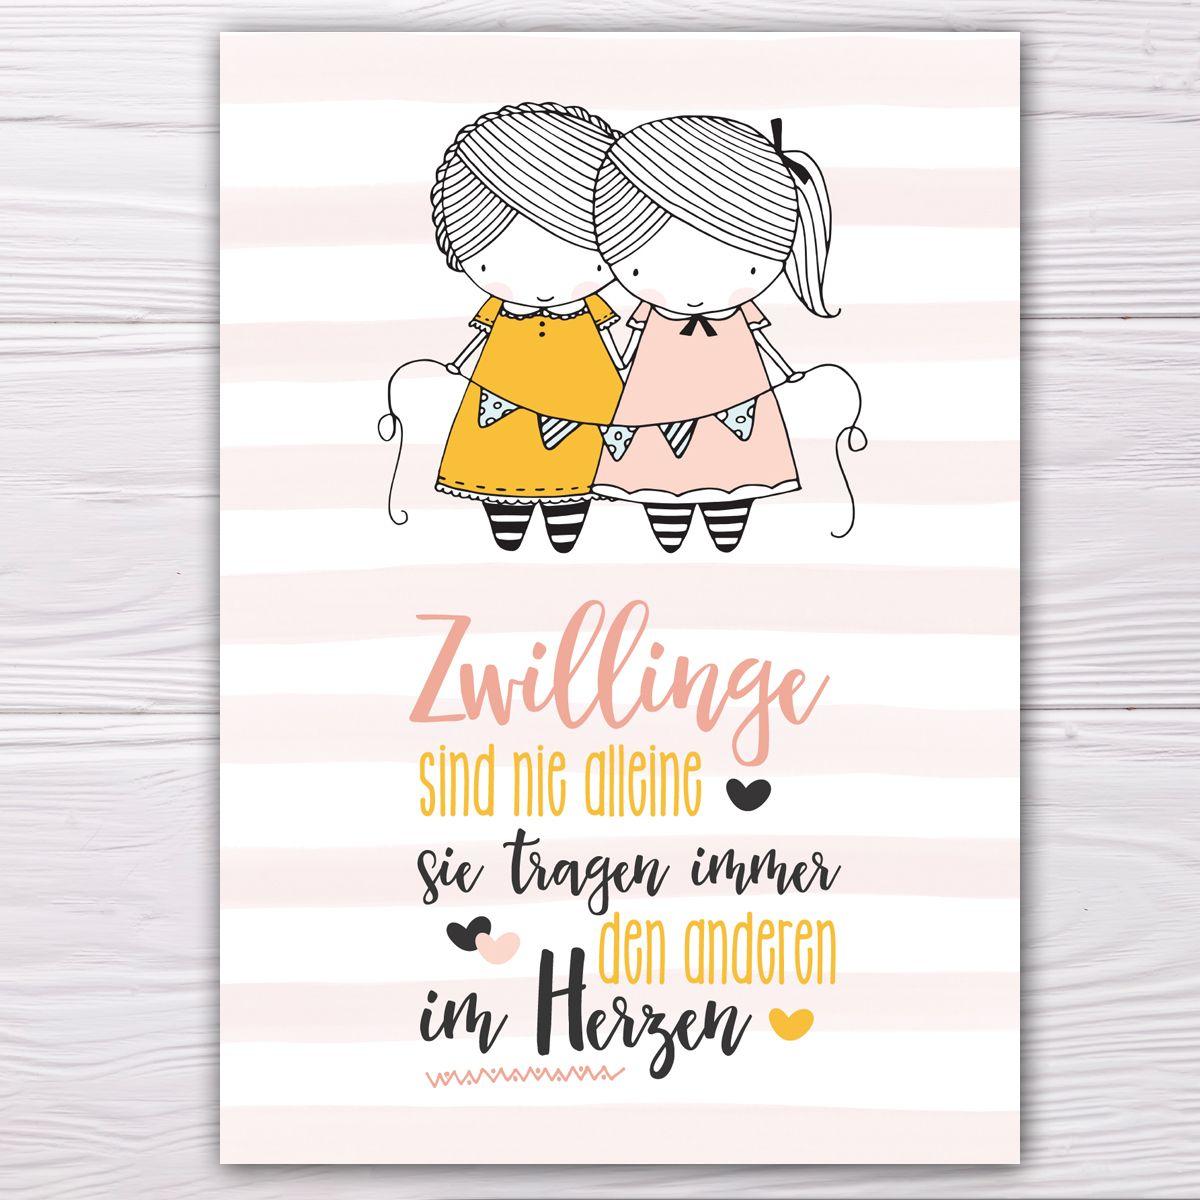 Postkarte Fur Zwillinge Gelb Rose Zwillinge Spruche Zwillinge